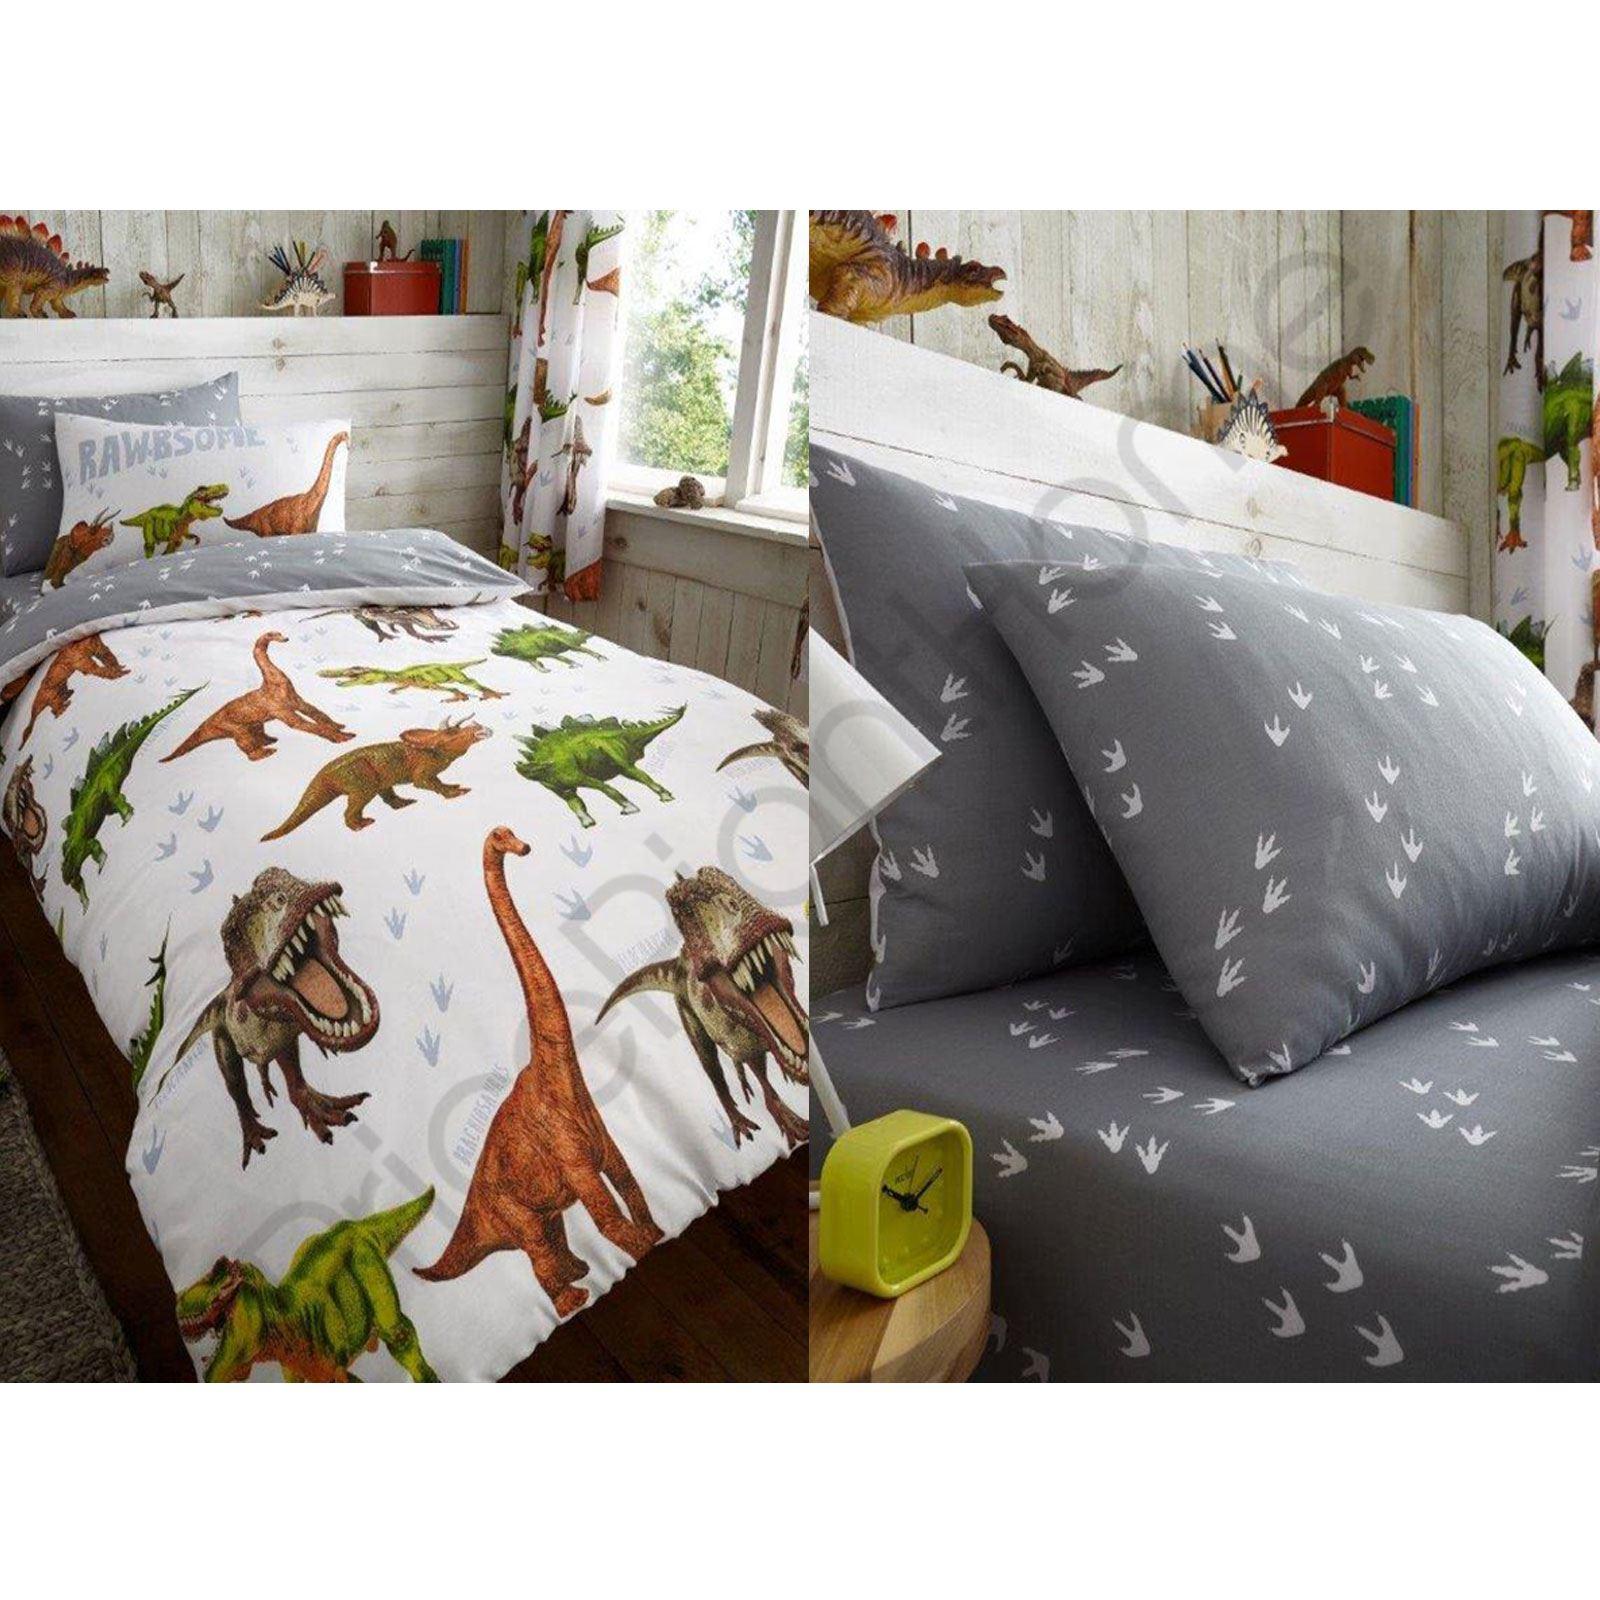 rawrsome dinosaure tyrannosaure gar ons set housse de couette simple drap ebay. Black Bedroom Furniture Sets. Home Design Ideas